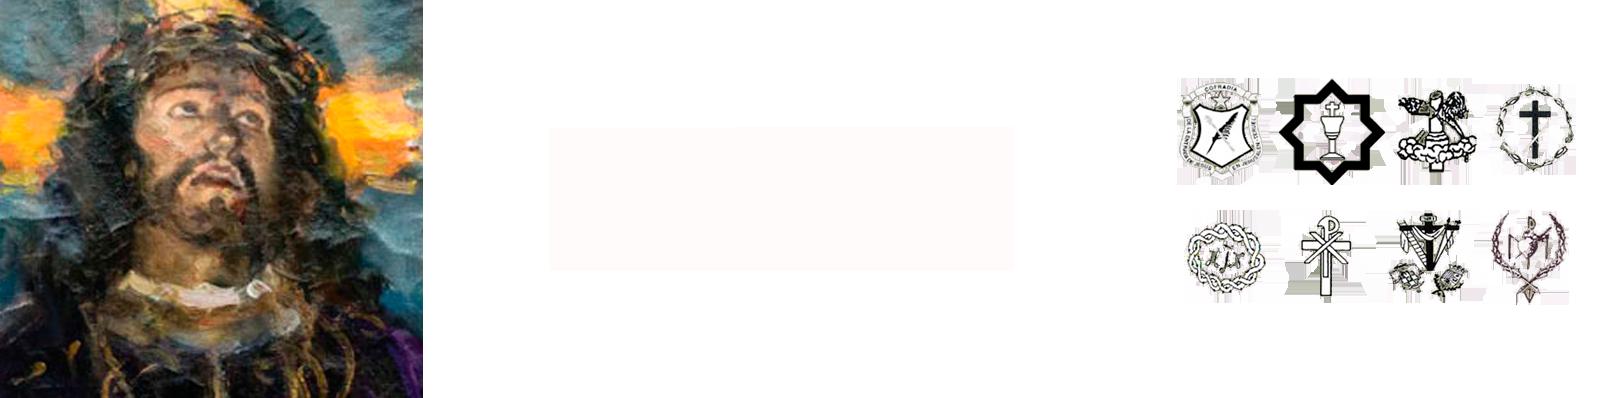 Semana Santa de Teruel 2008